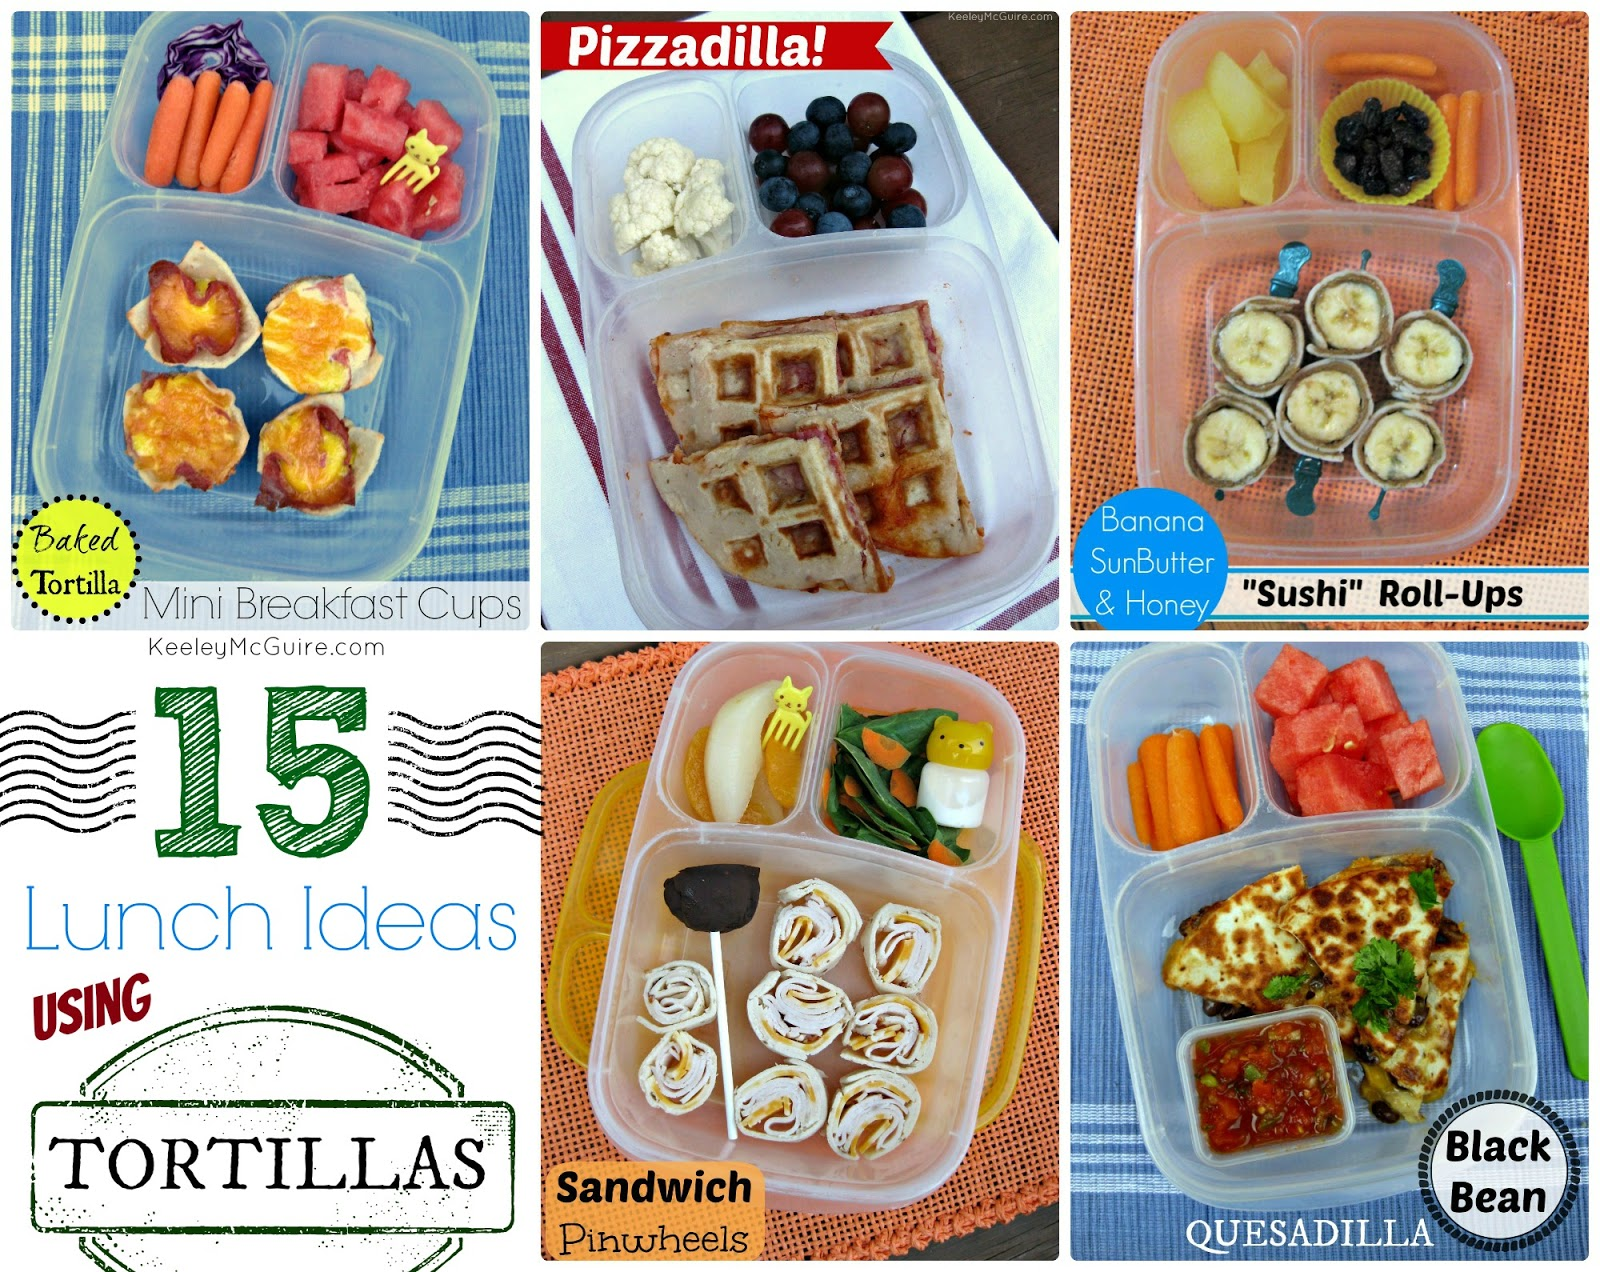 gluten free allergy friendly lunch made easy 15 tortilla ideas